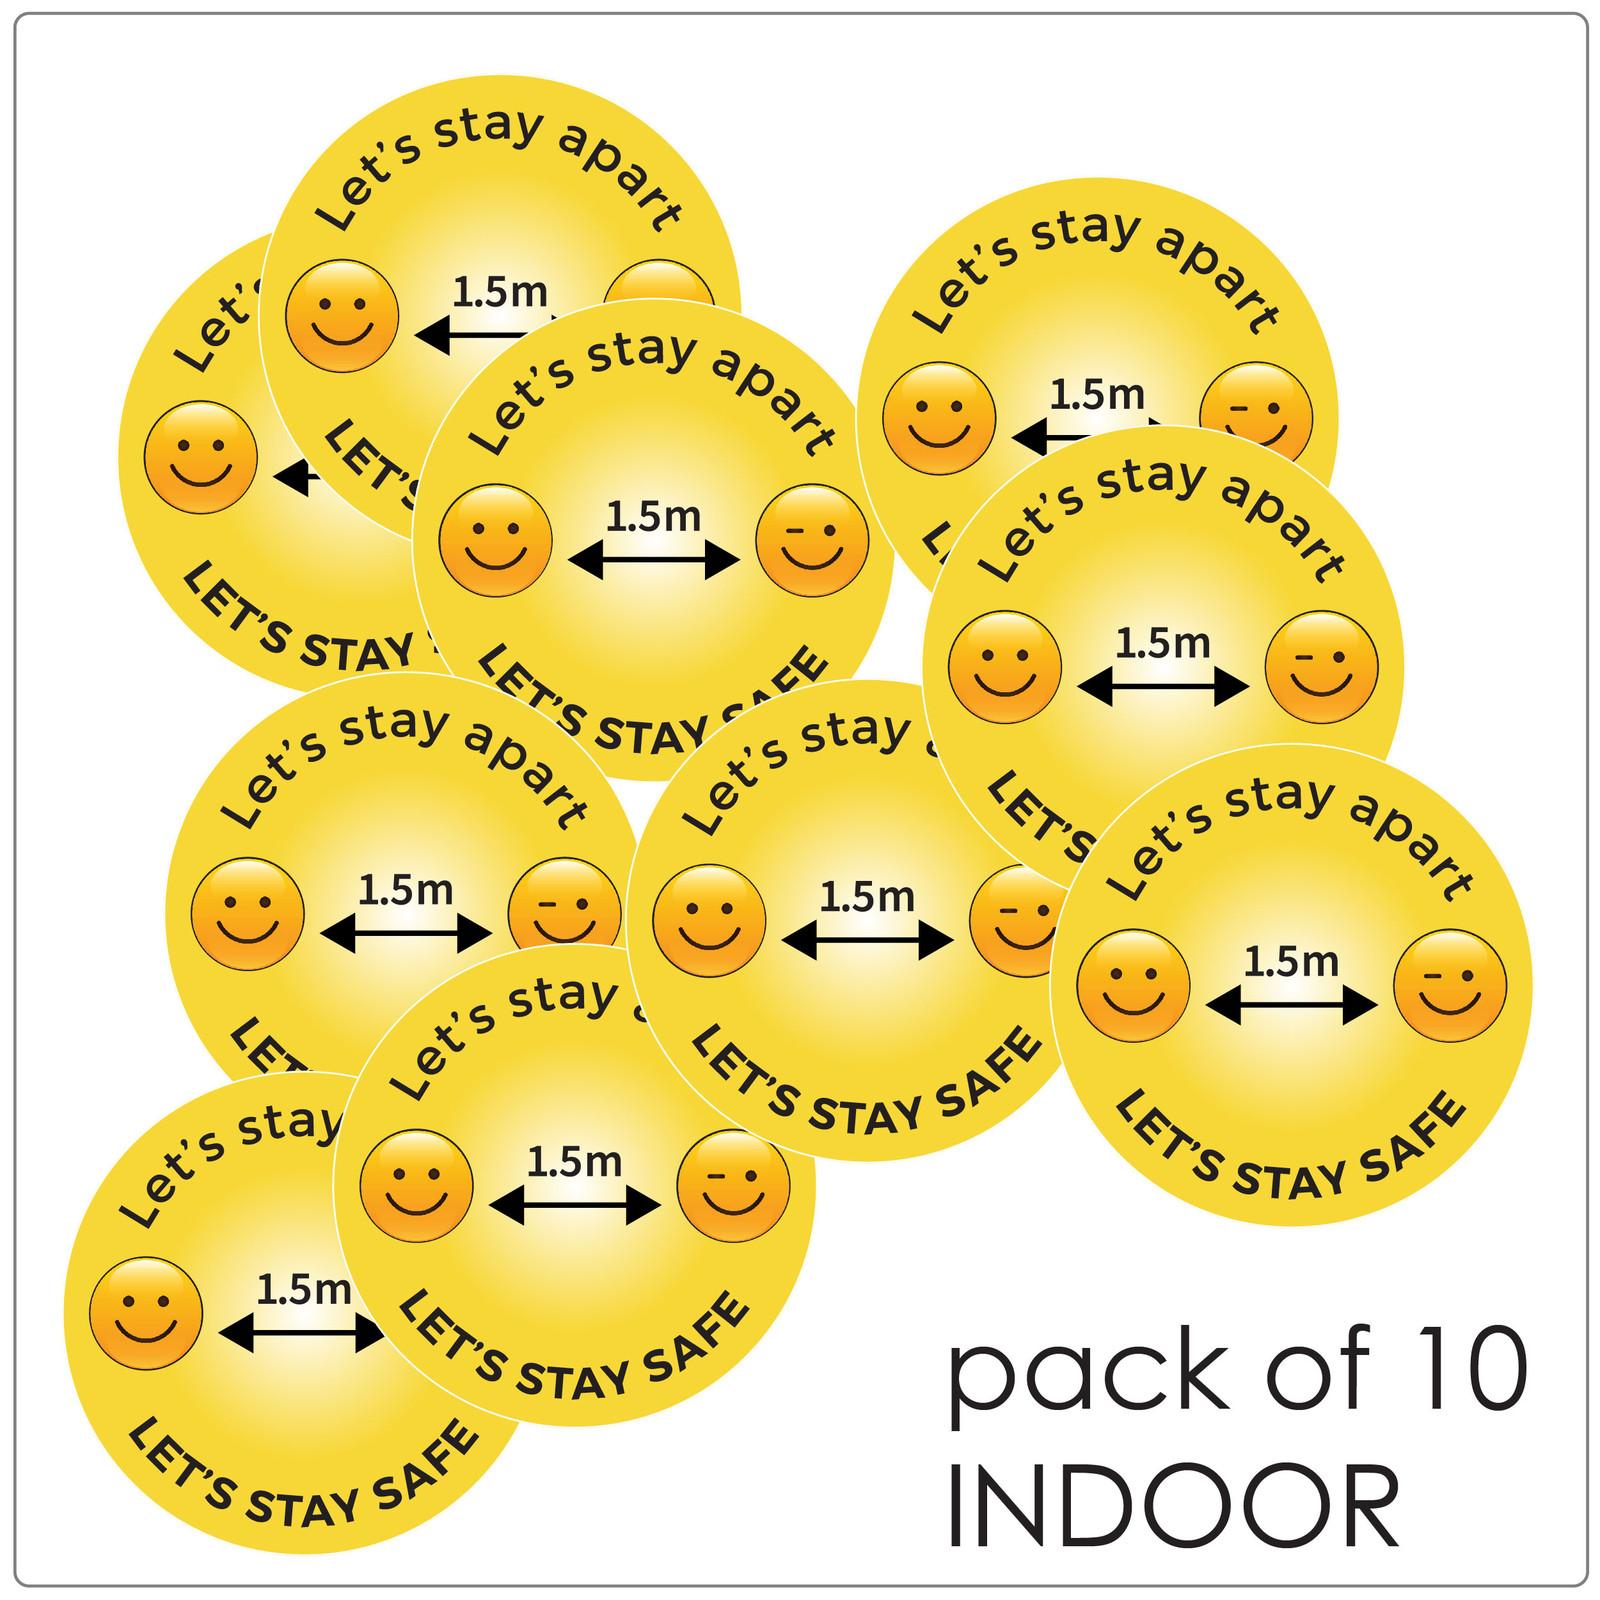 1.5 meter social distancing floor sticker for hard floors, pack of 10, emoji Self-adhesive Corona floor marker safety floor signs for COVID-19